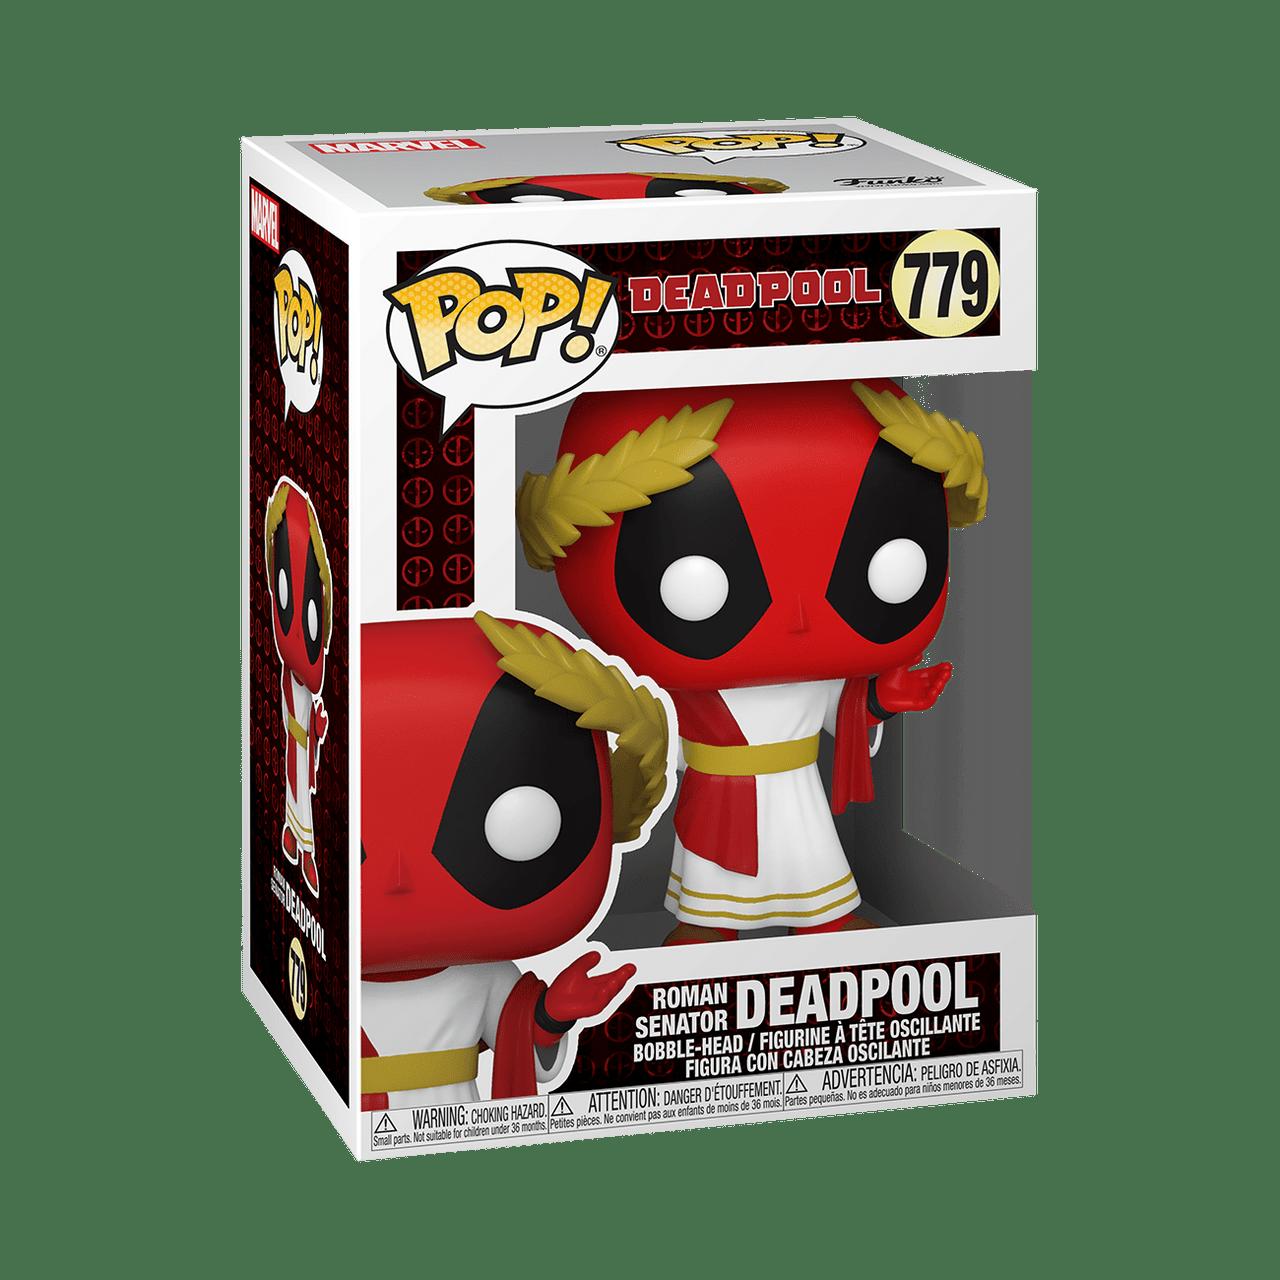 POP! Marvel ~ Deadpool ~ Roman Senator Deadpool #779